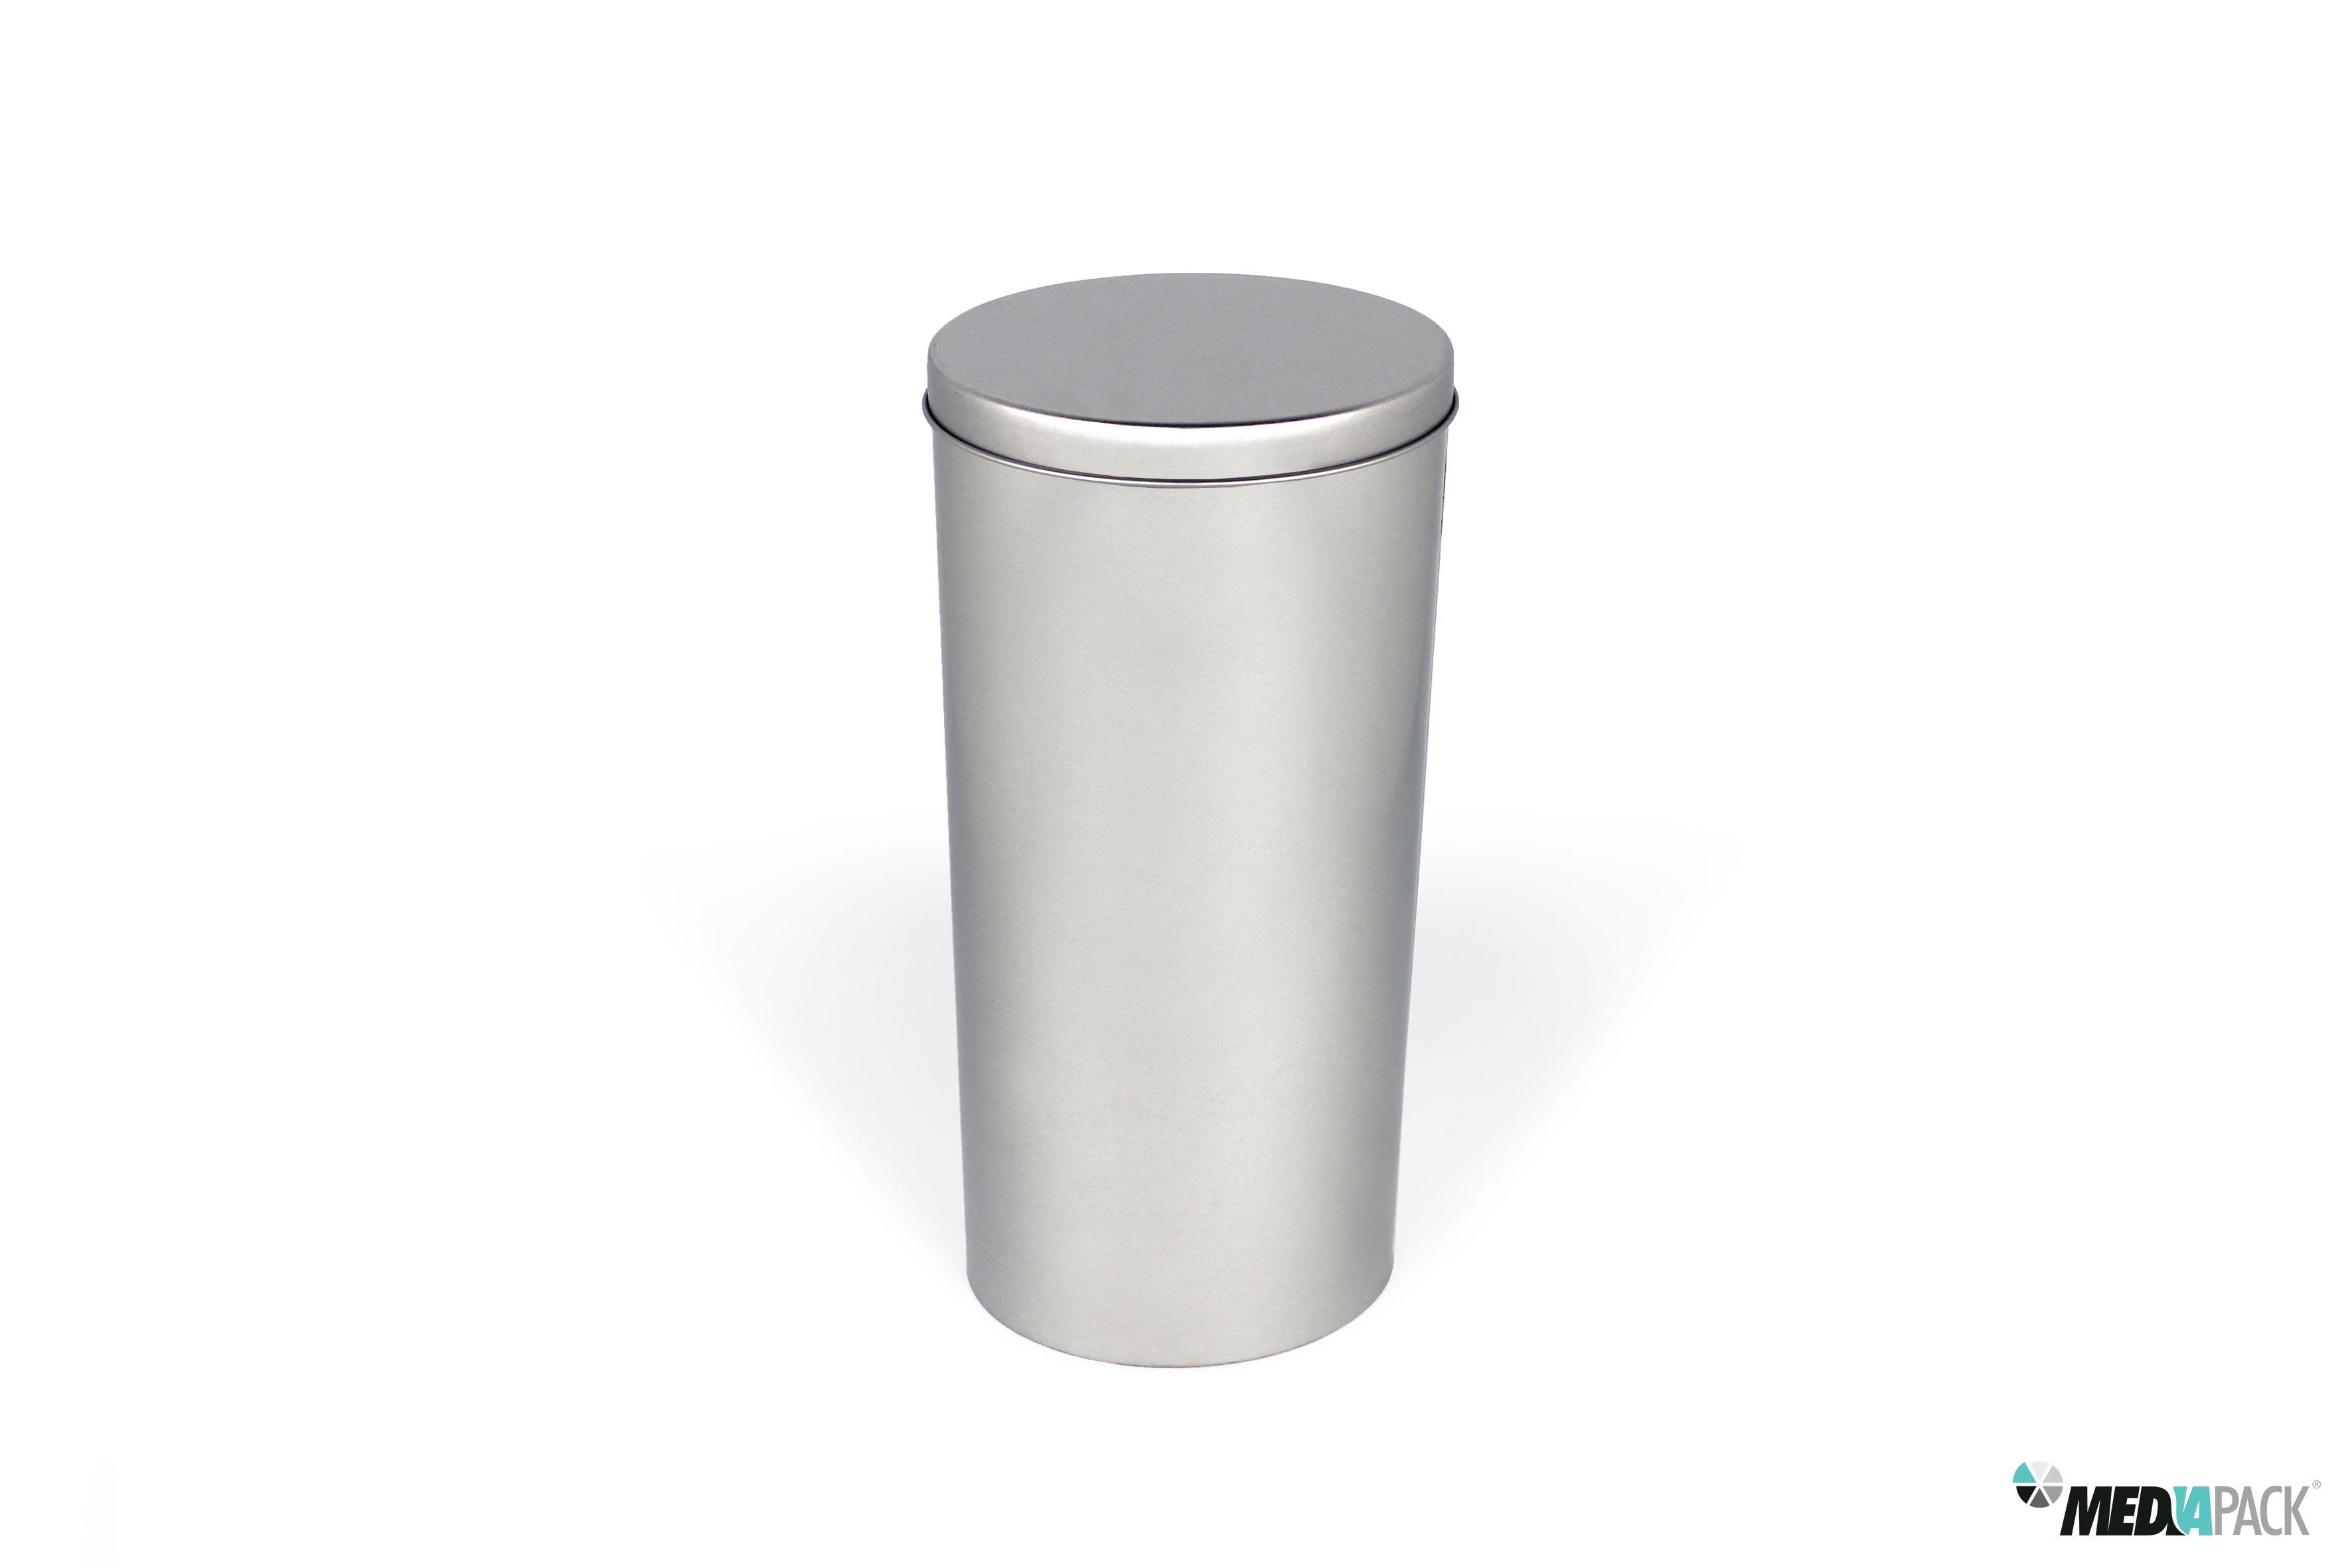 Lata de metal oval personalizável. http://loja.mediapack.com/pt/embalagem-de-metal-oval_1/